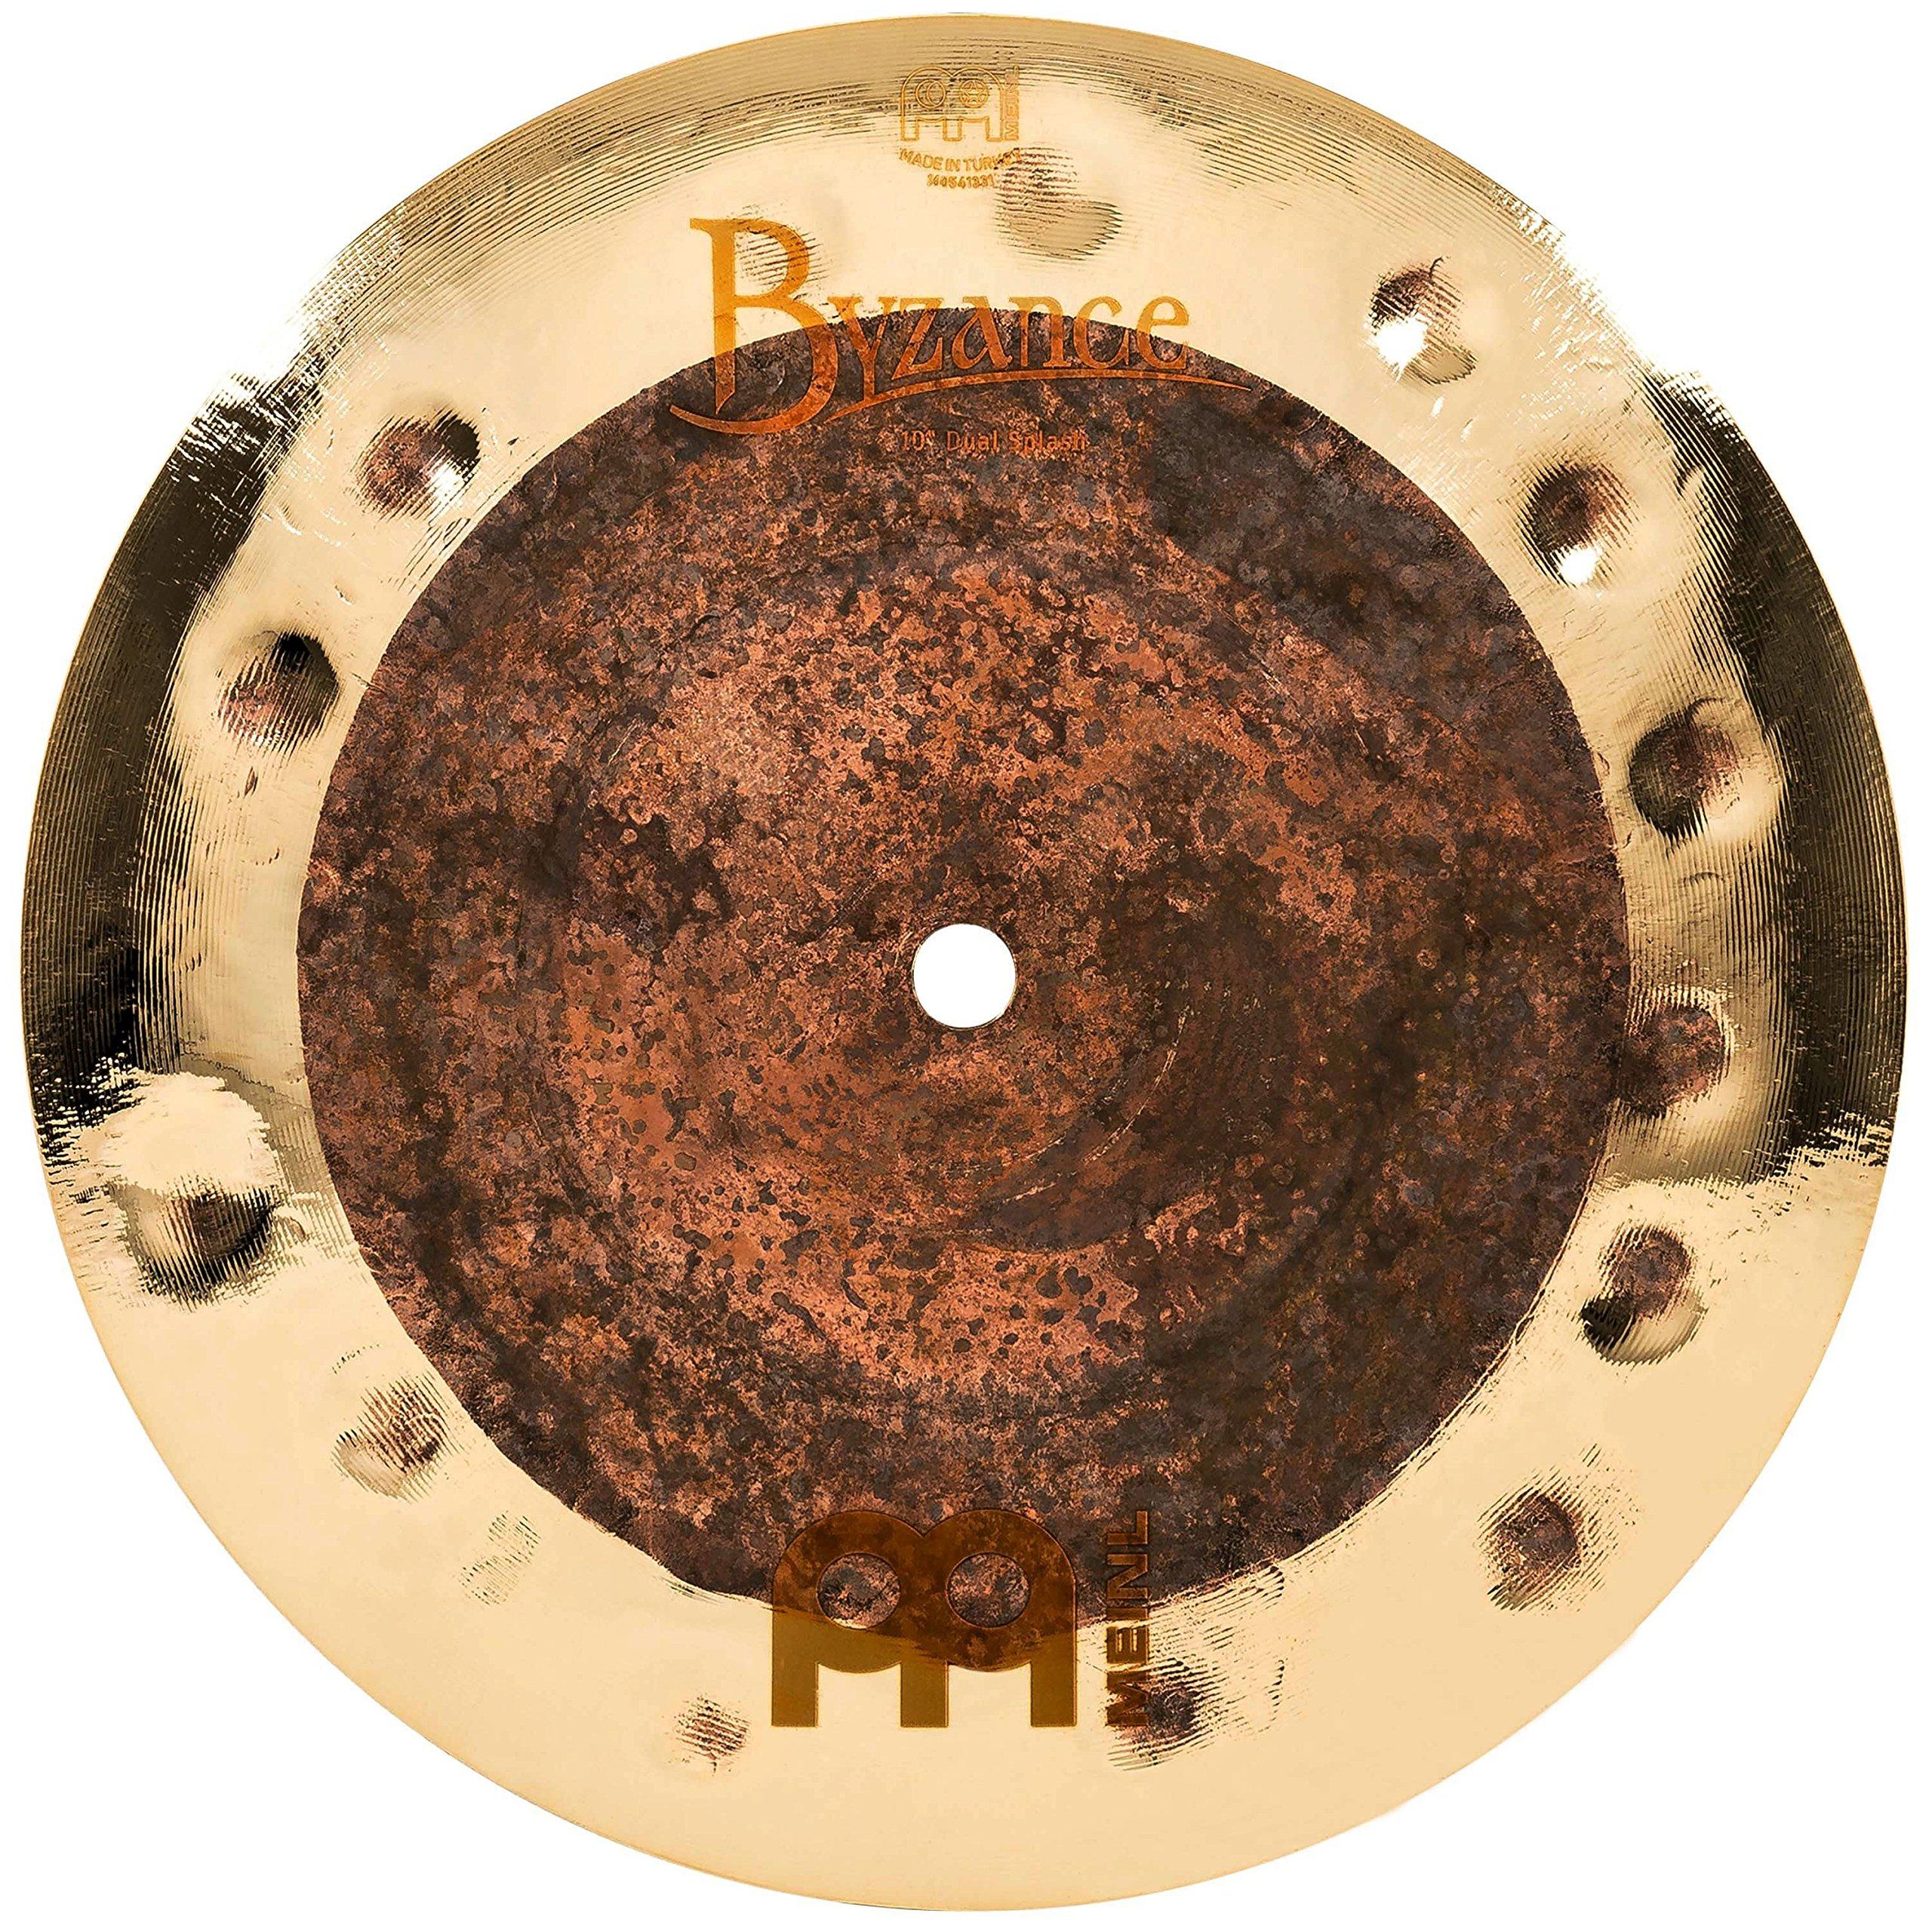 Meinl Cymbals B10DUS Byzance Extra Dry 10-Inch Dual Splash Cymbal (VIDEO) by Meinl Cymbals